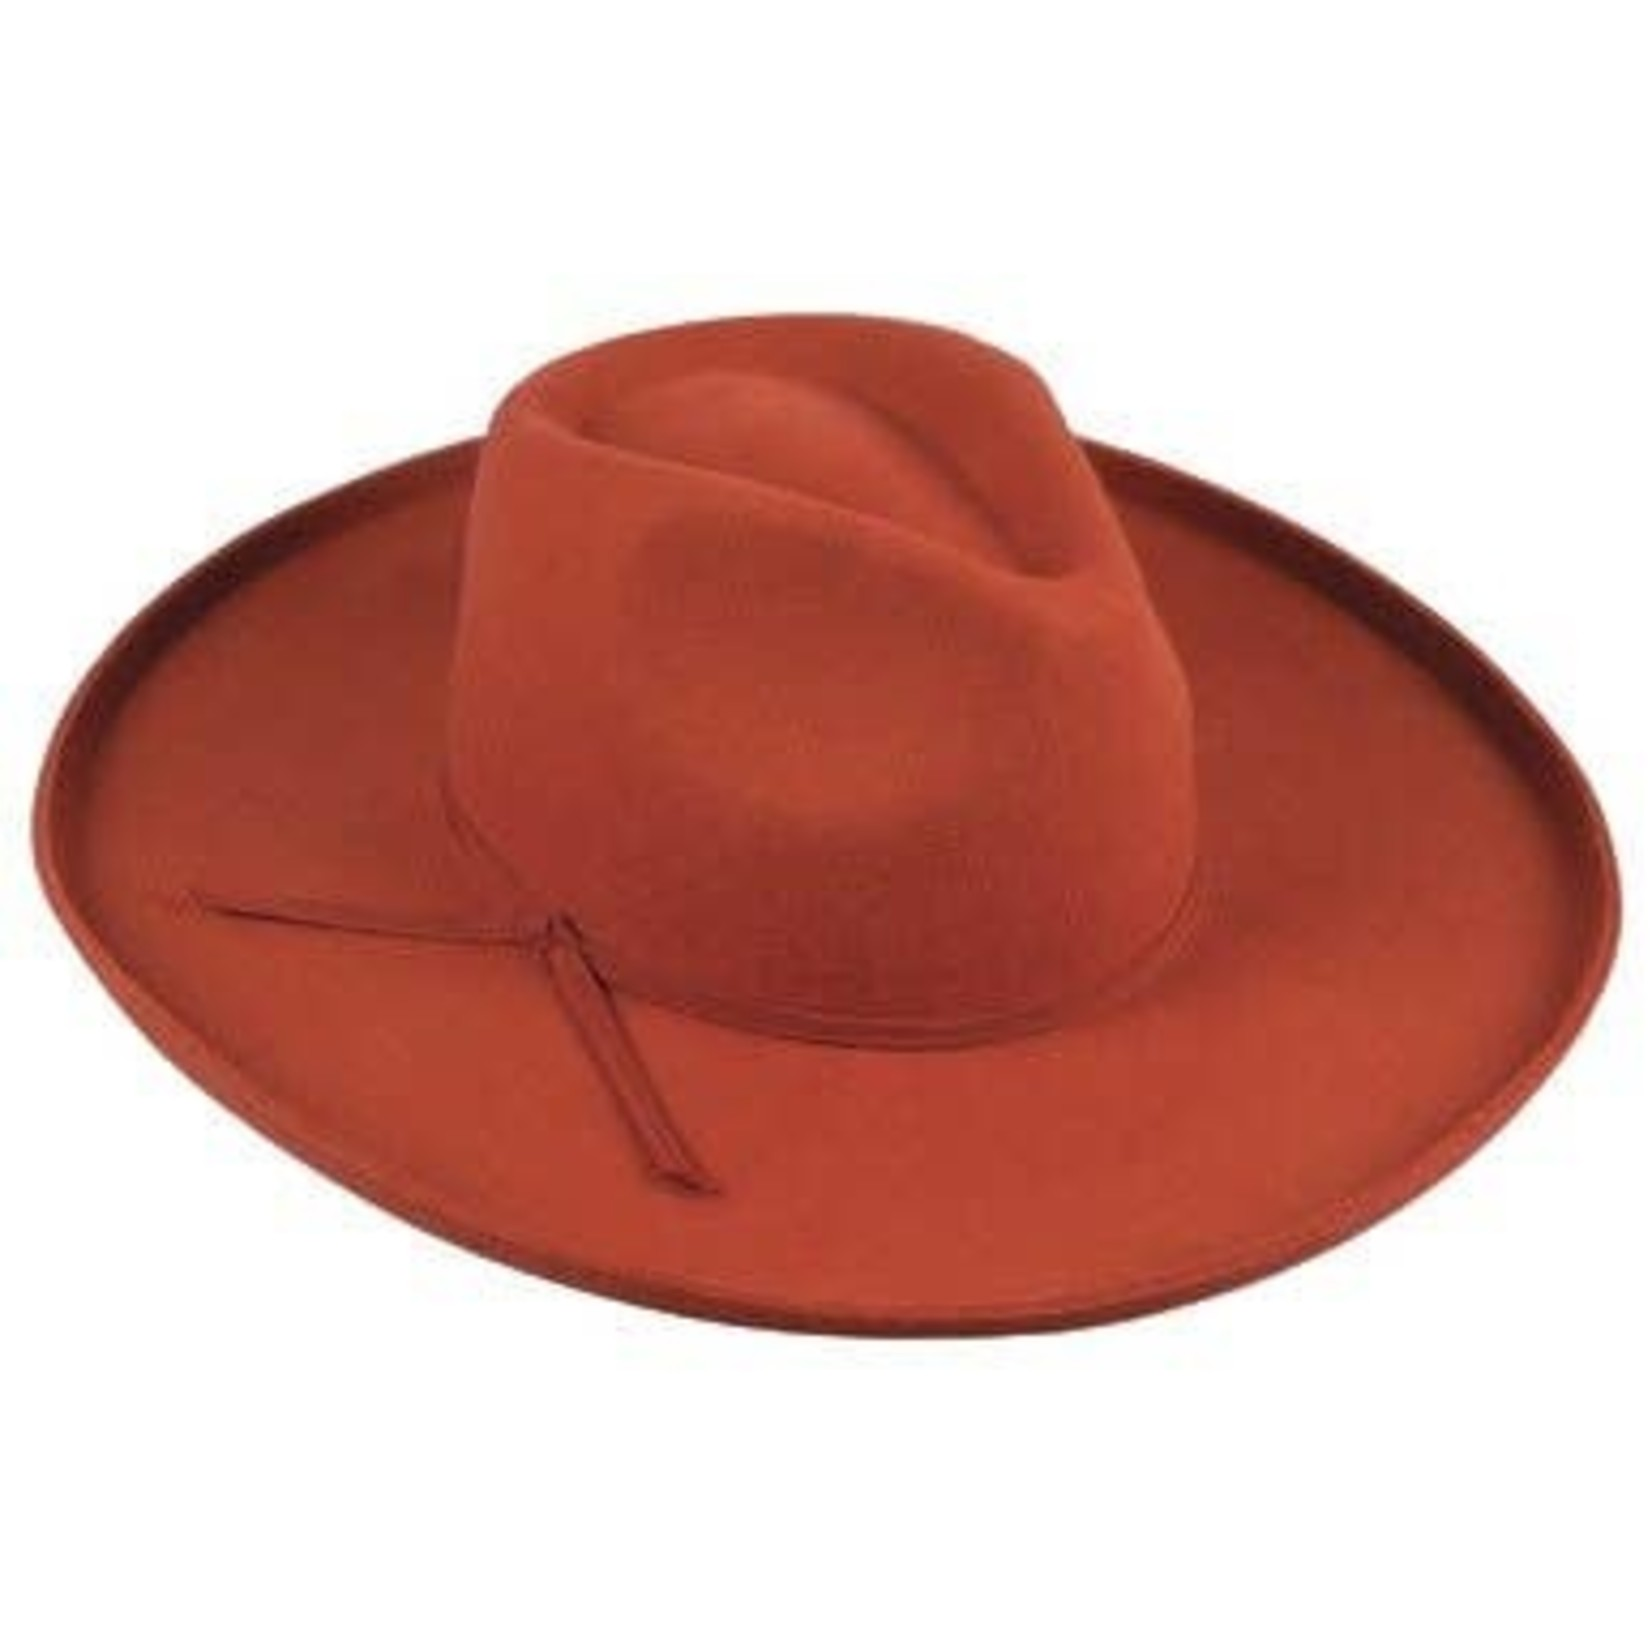 Jeanne Simmons Rust Wool Felt Kettle Brim Pinch Fedora Crn Hat